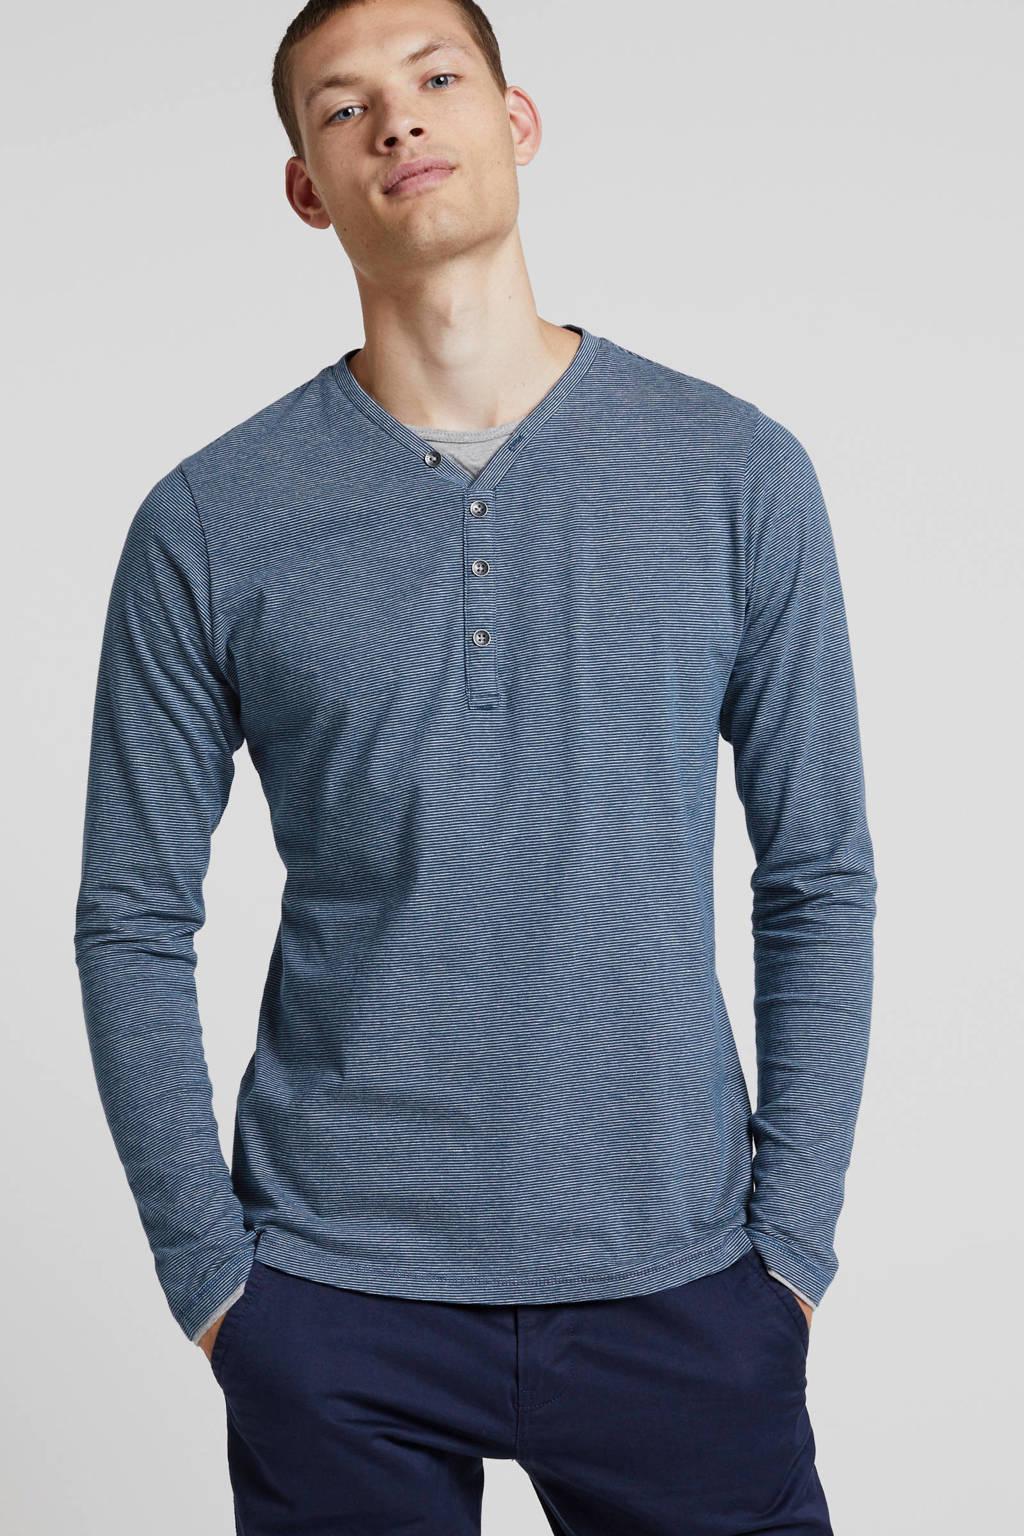 Petrol Industries T-shirt met v-hals, Blauw